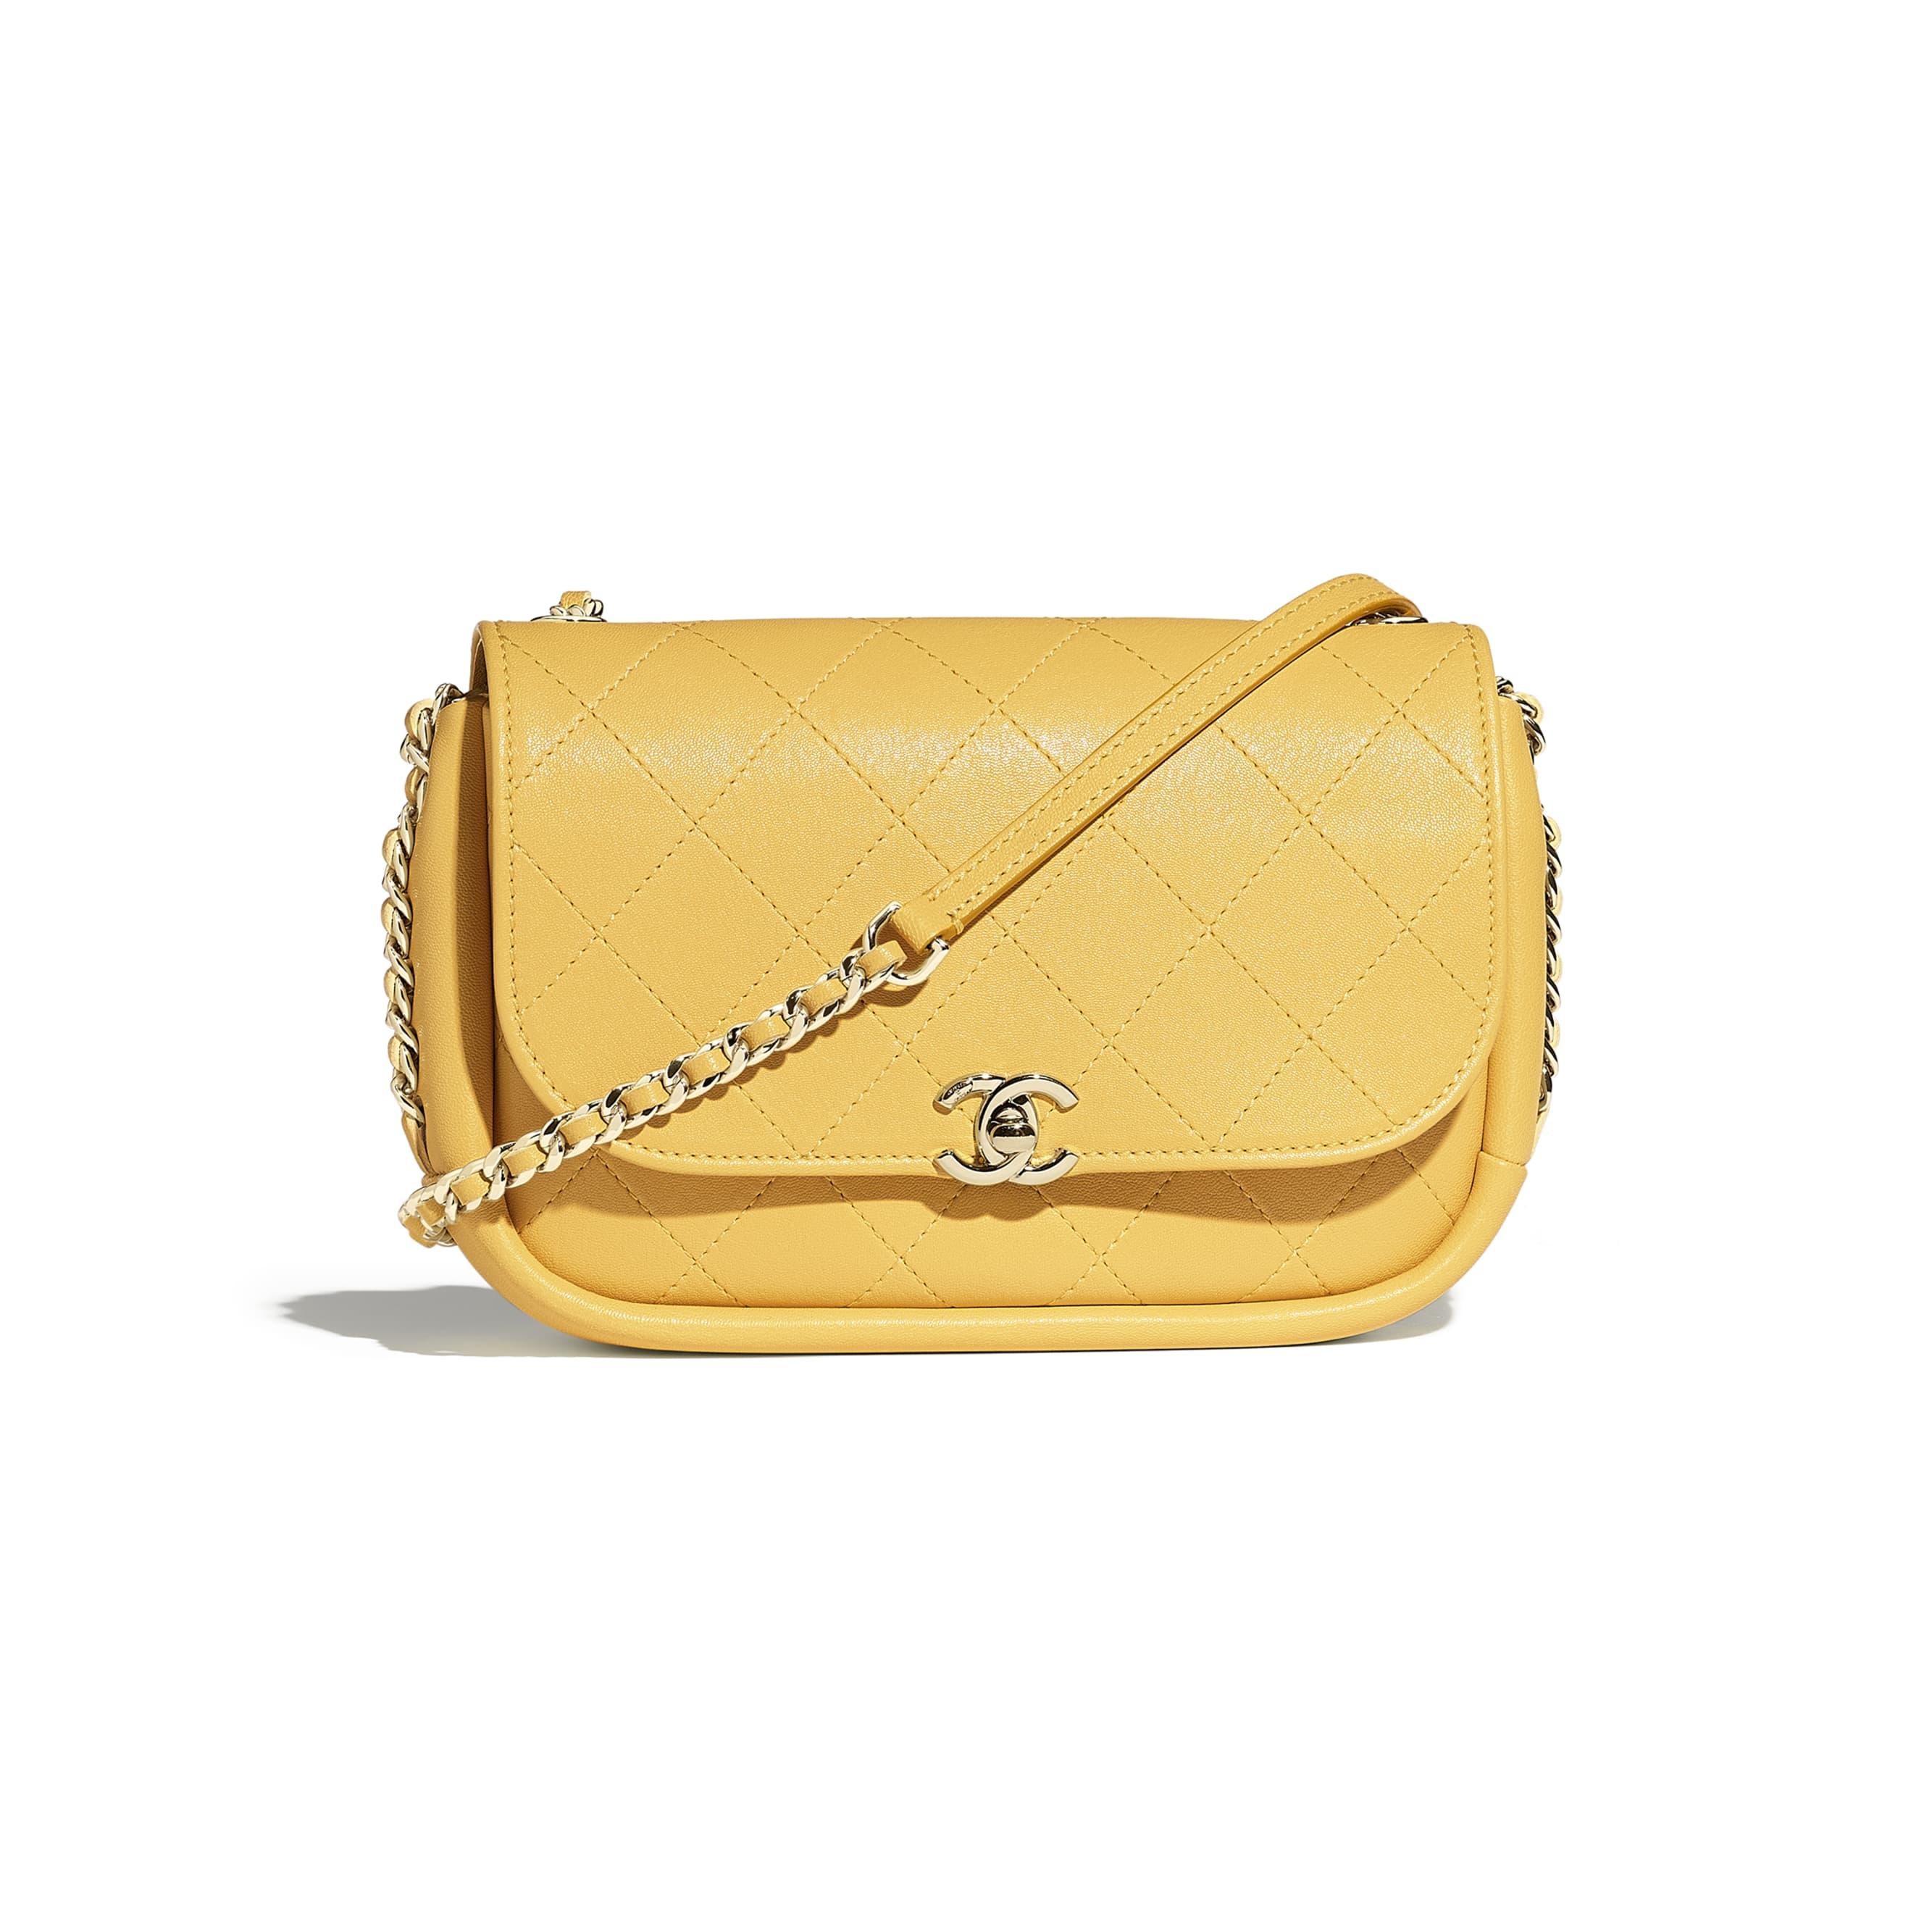 Flap Bag - Yellow - Lambskin & Gold-Tone Metal - Default view - see standard sized version